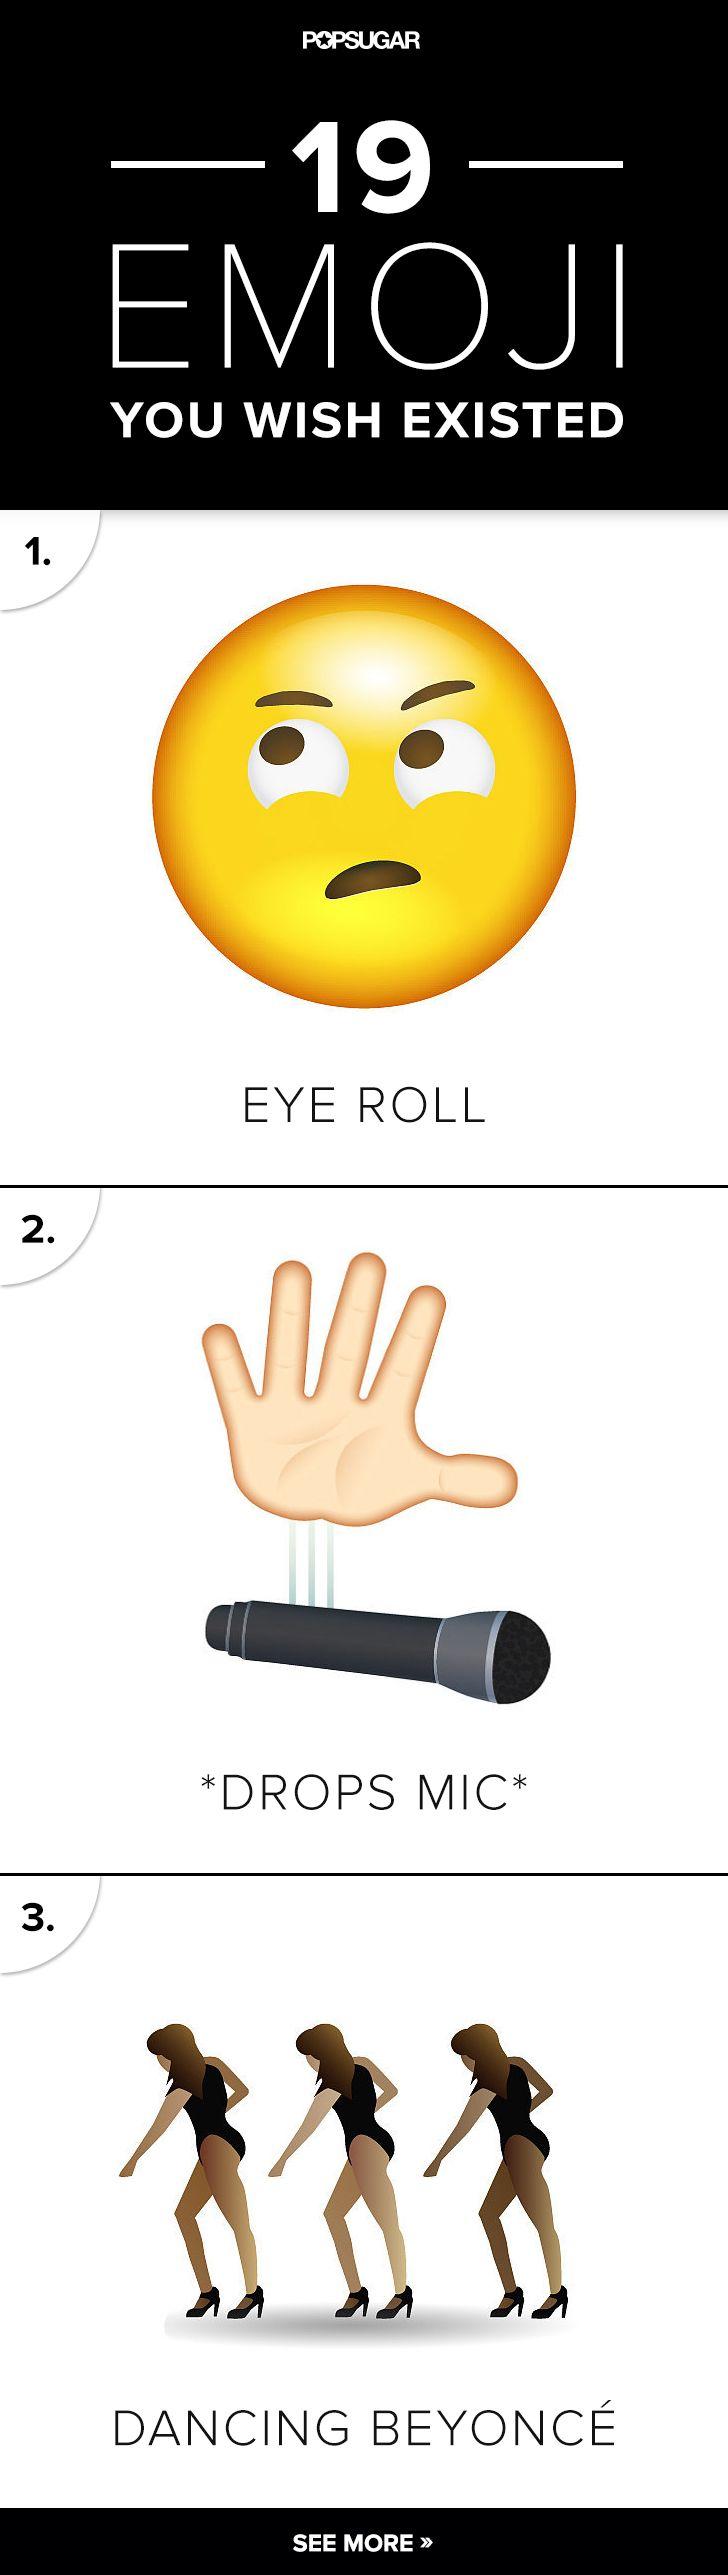 The mic drop emoji is essential.